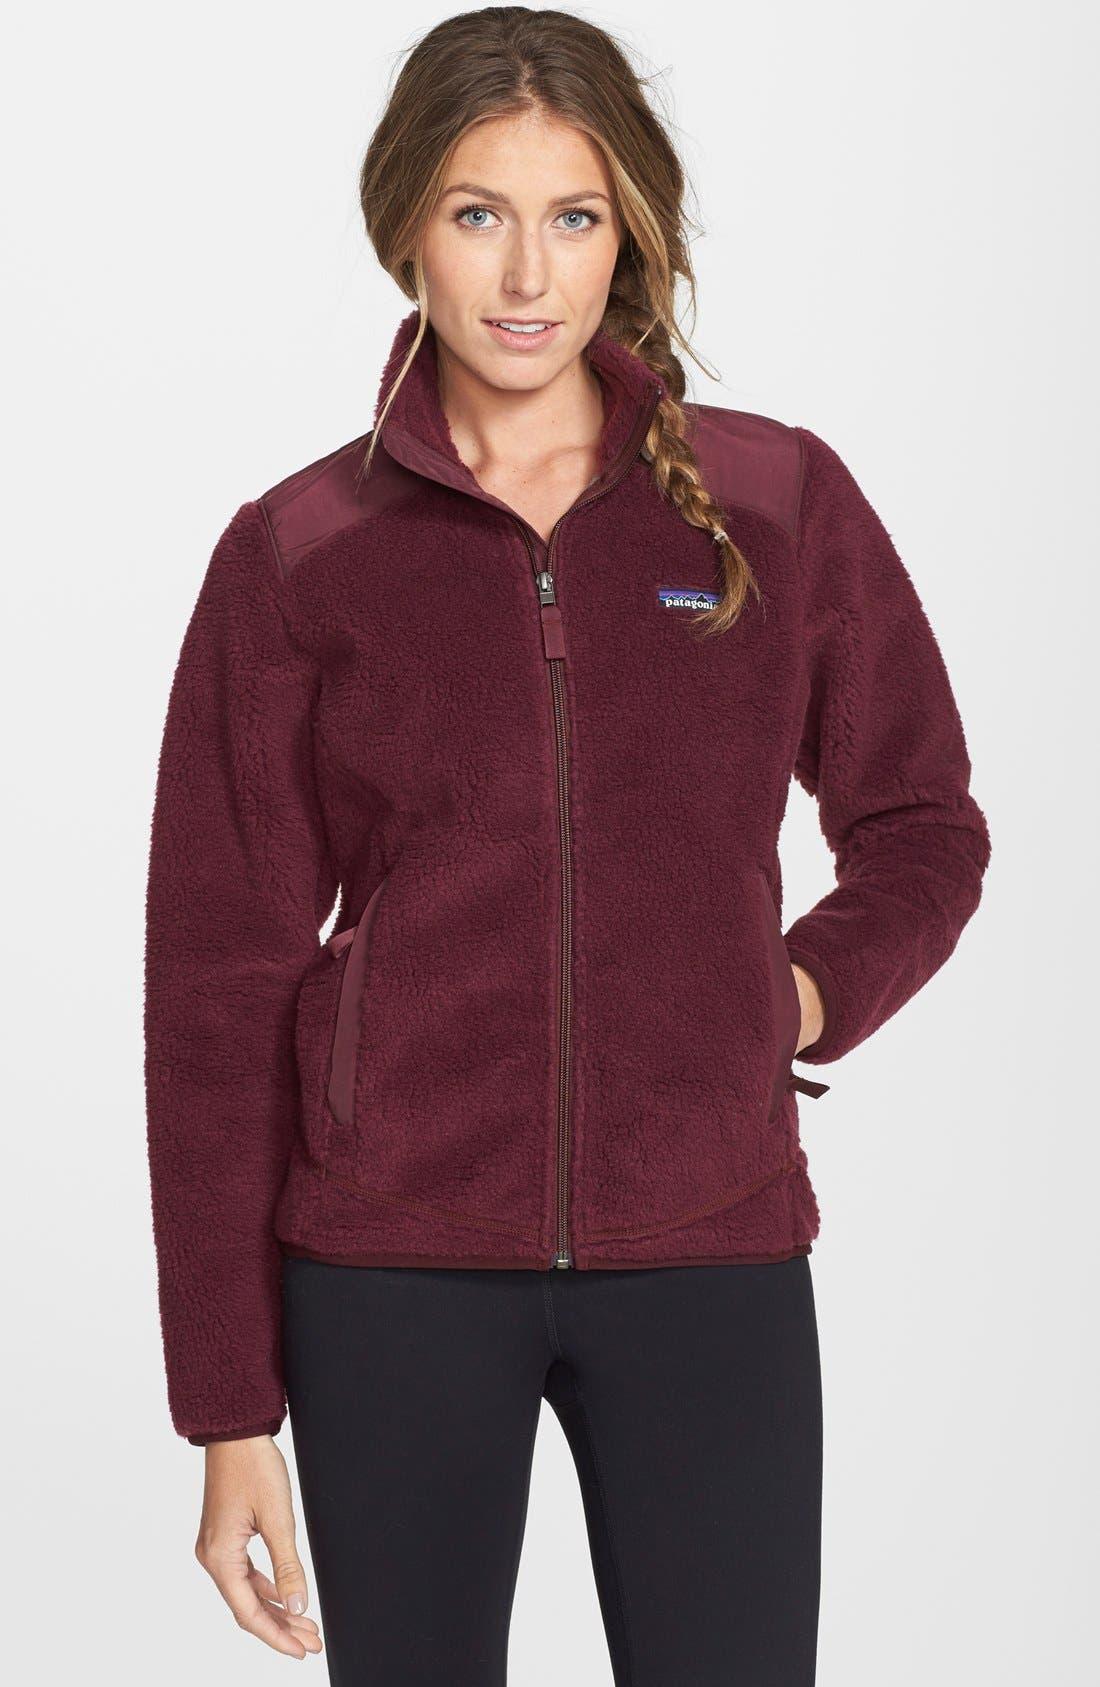 Alternate Image 1 Selected - Patagonia 'Retro-X' Fleece Jacket